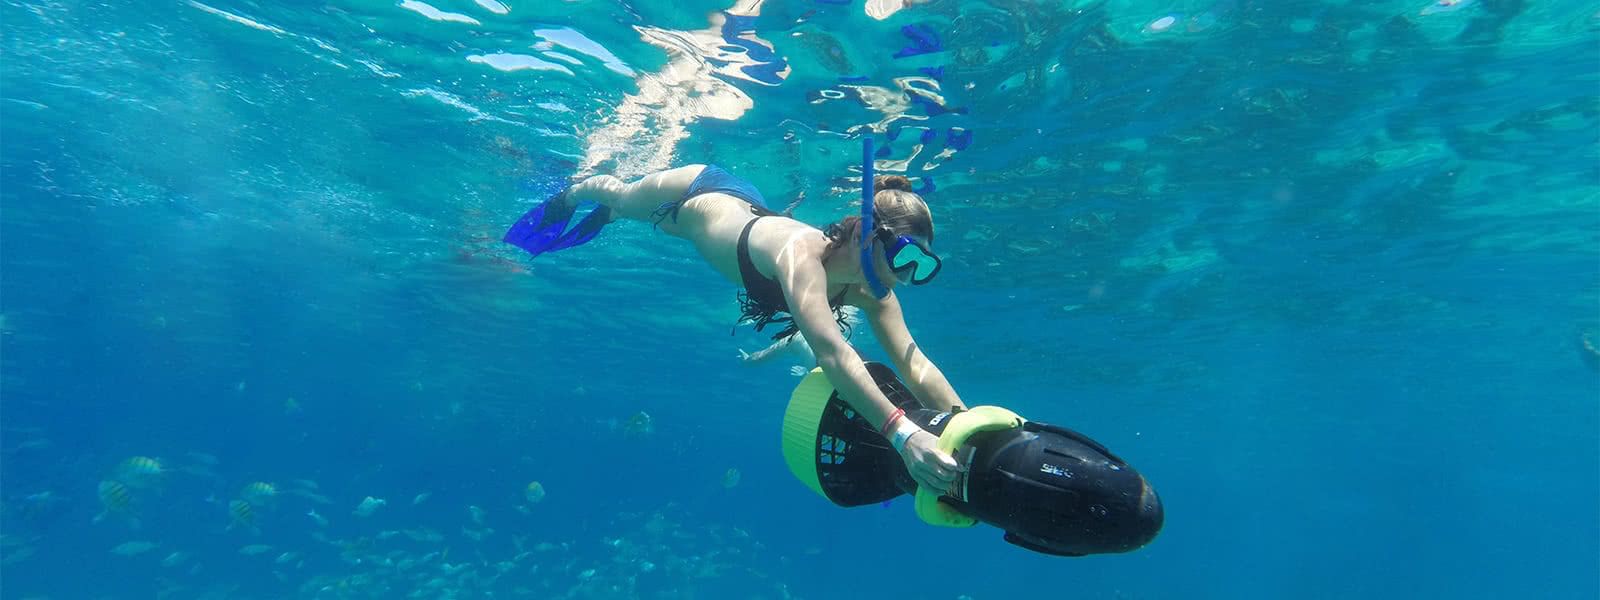 snorkel-sea-adventure-2.jpg